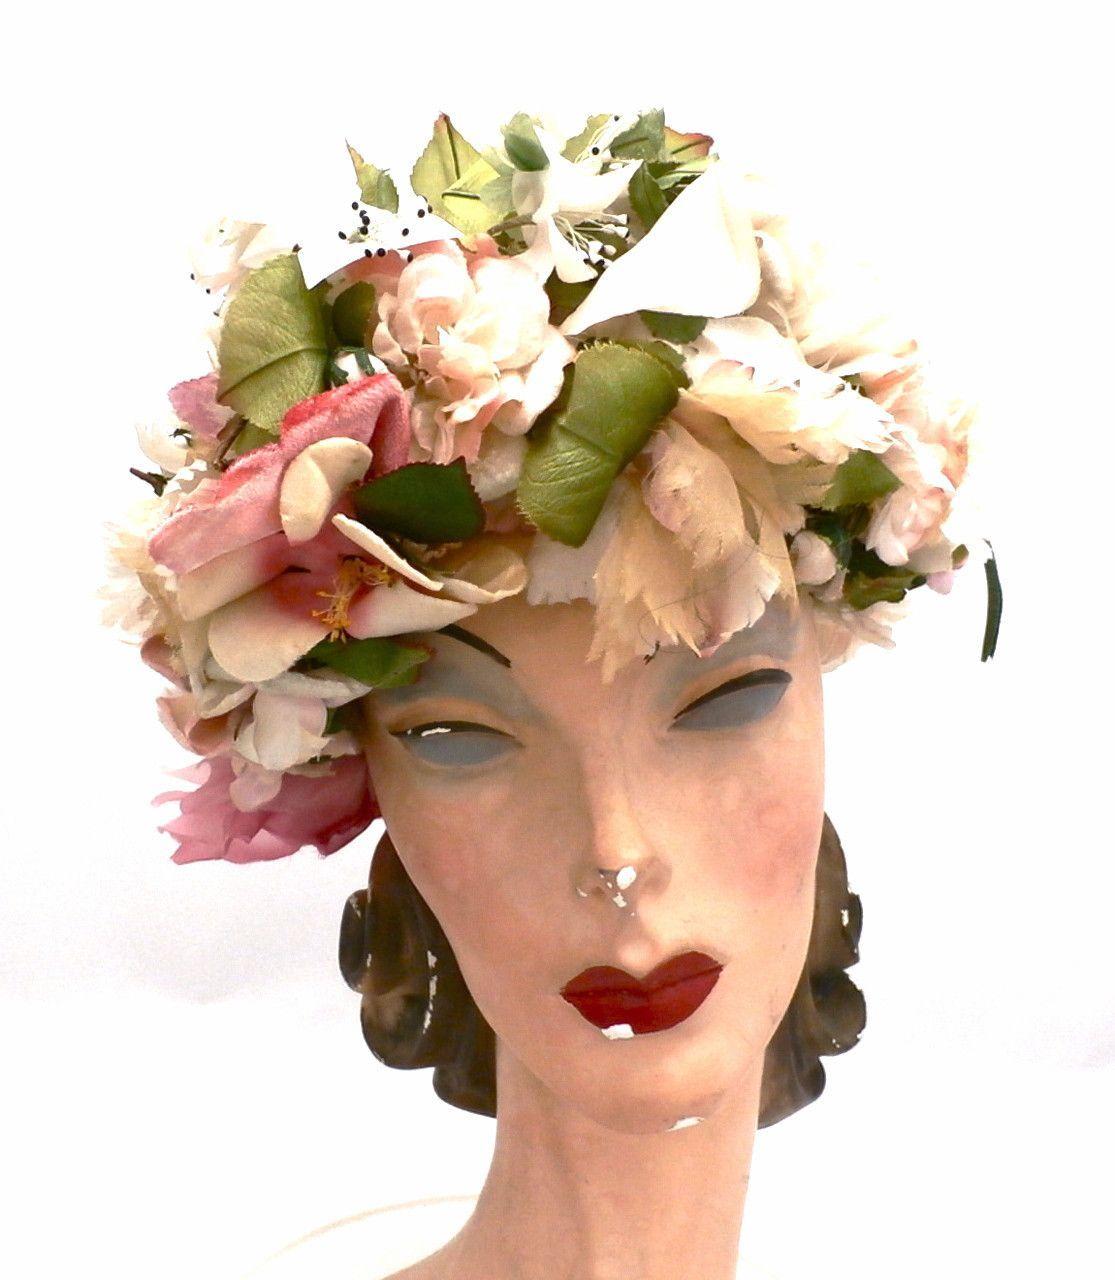 Vintage Christian Dior Hat Silk Floral Explosion 1950s Large Vintage Clothes Women Hats Vintage Vintage Outfits